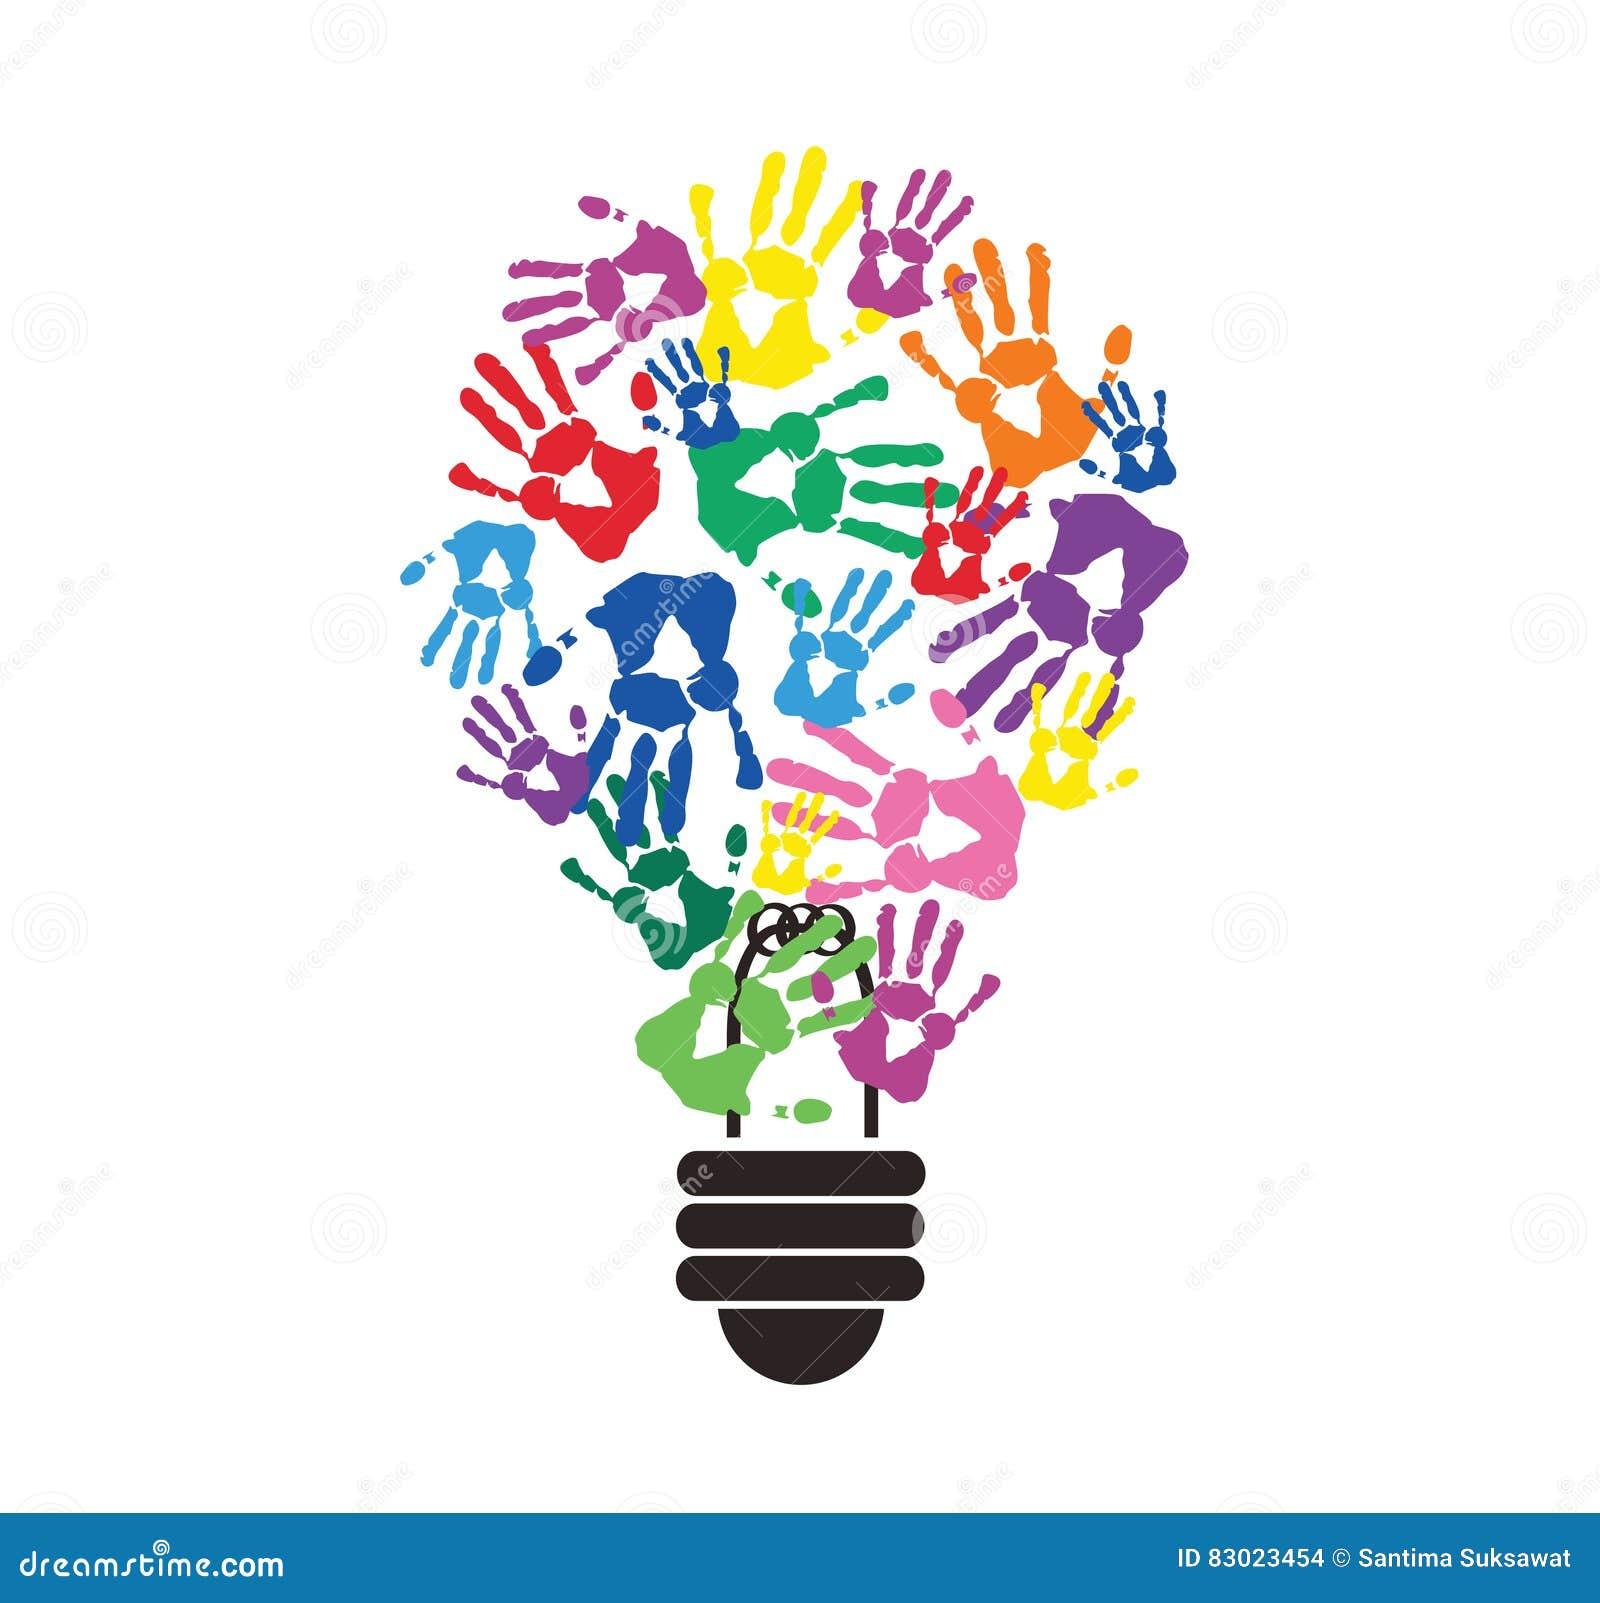 Colorful handprint in lightbulb shape symbol of thinking concept colorful handprint in lightbulb shape symbol of thinking concept illustration lamp biocorpaavc